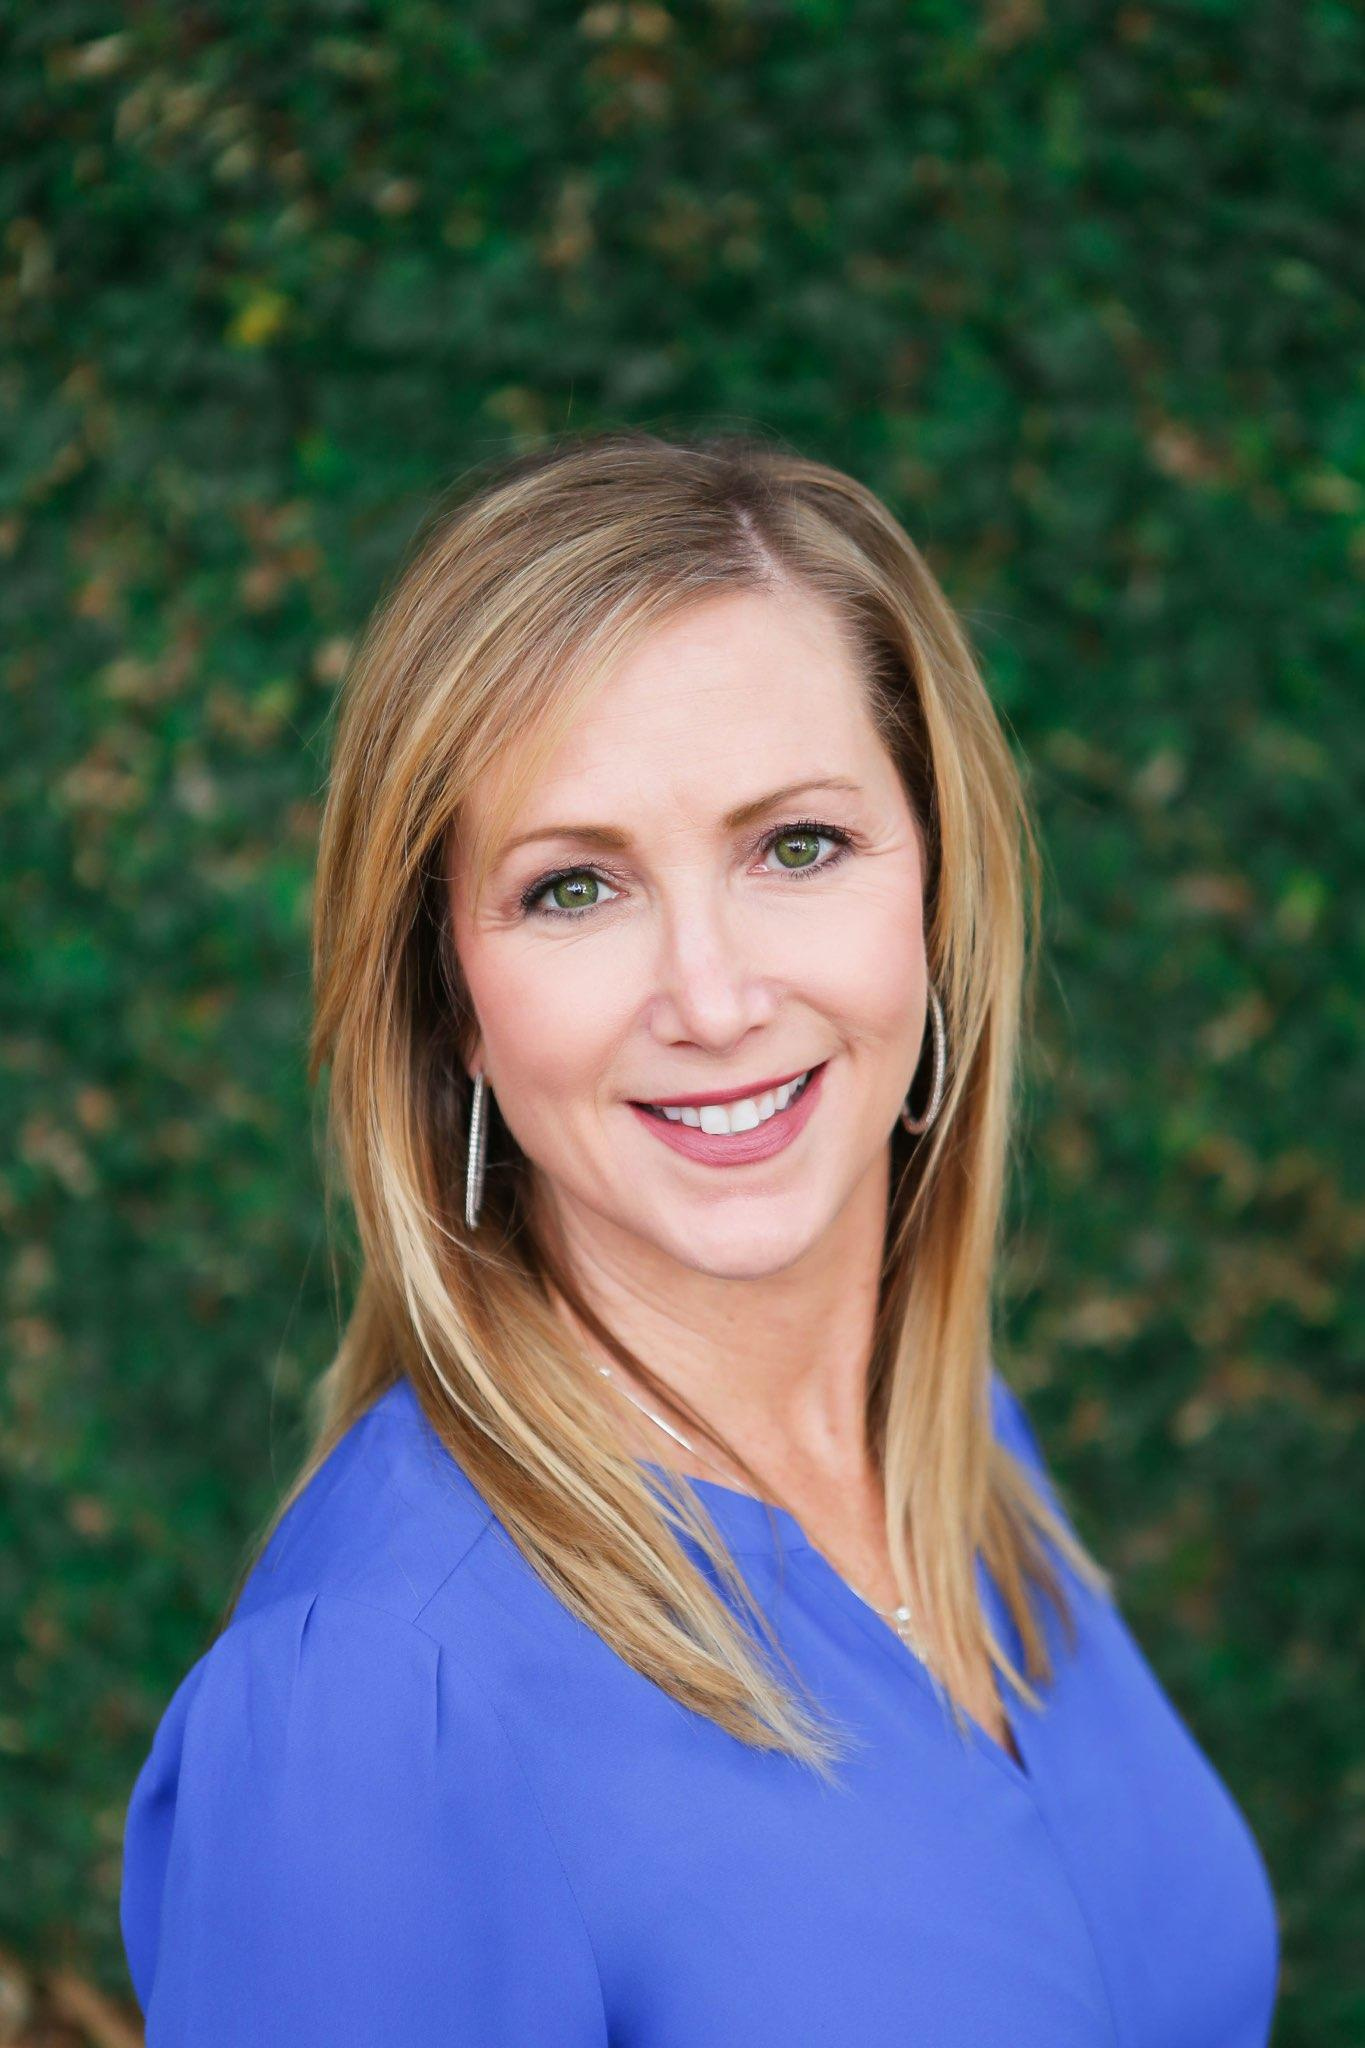 Rebekah Brown - State Farm Insurance Agent image 3